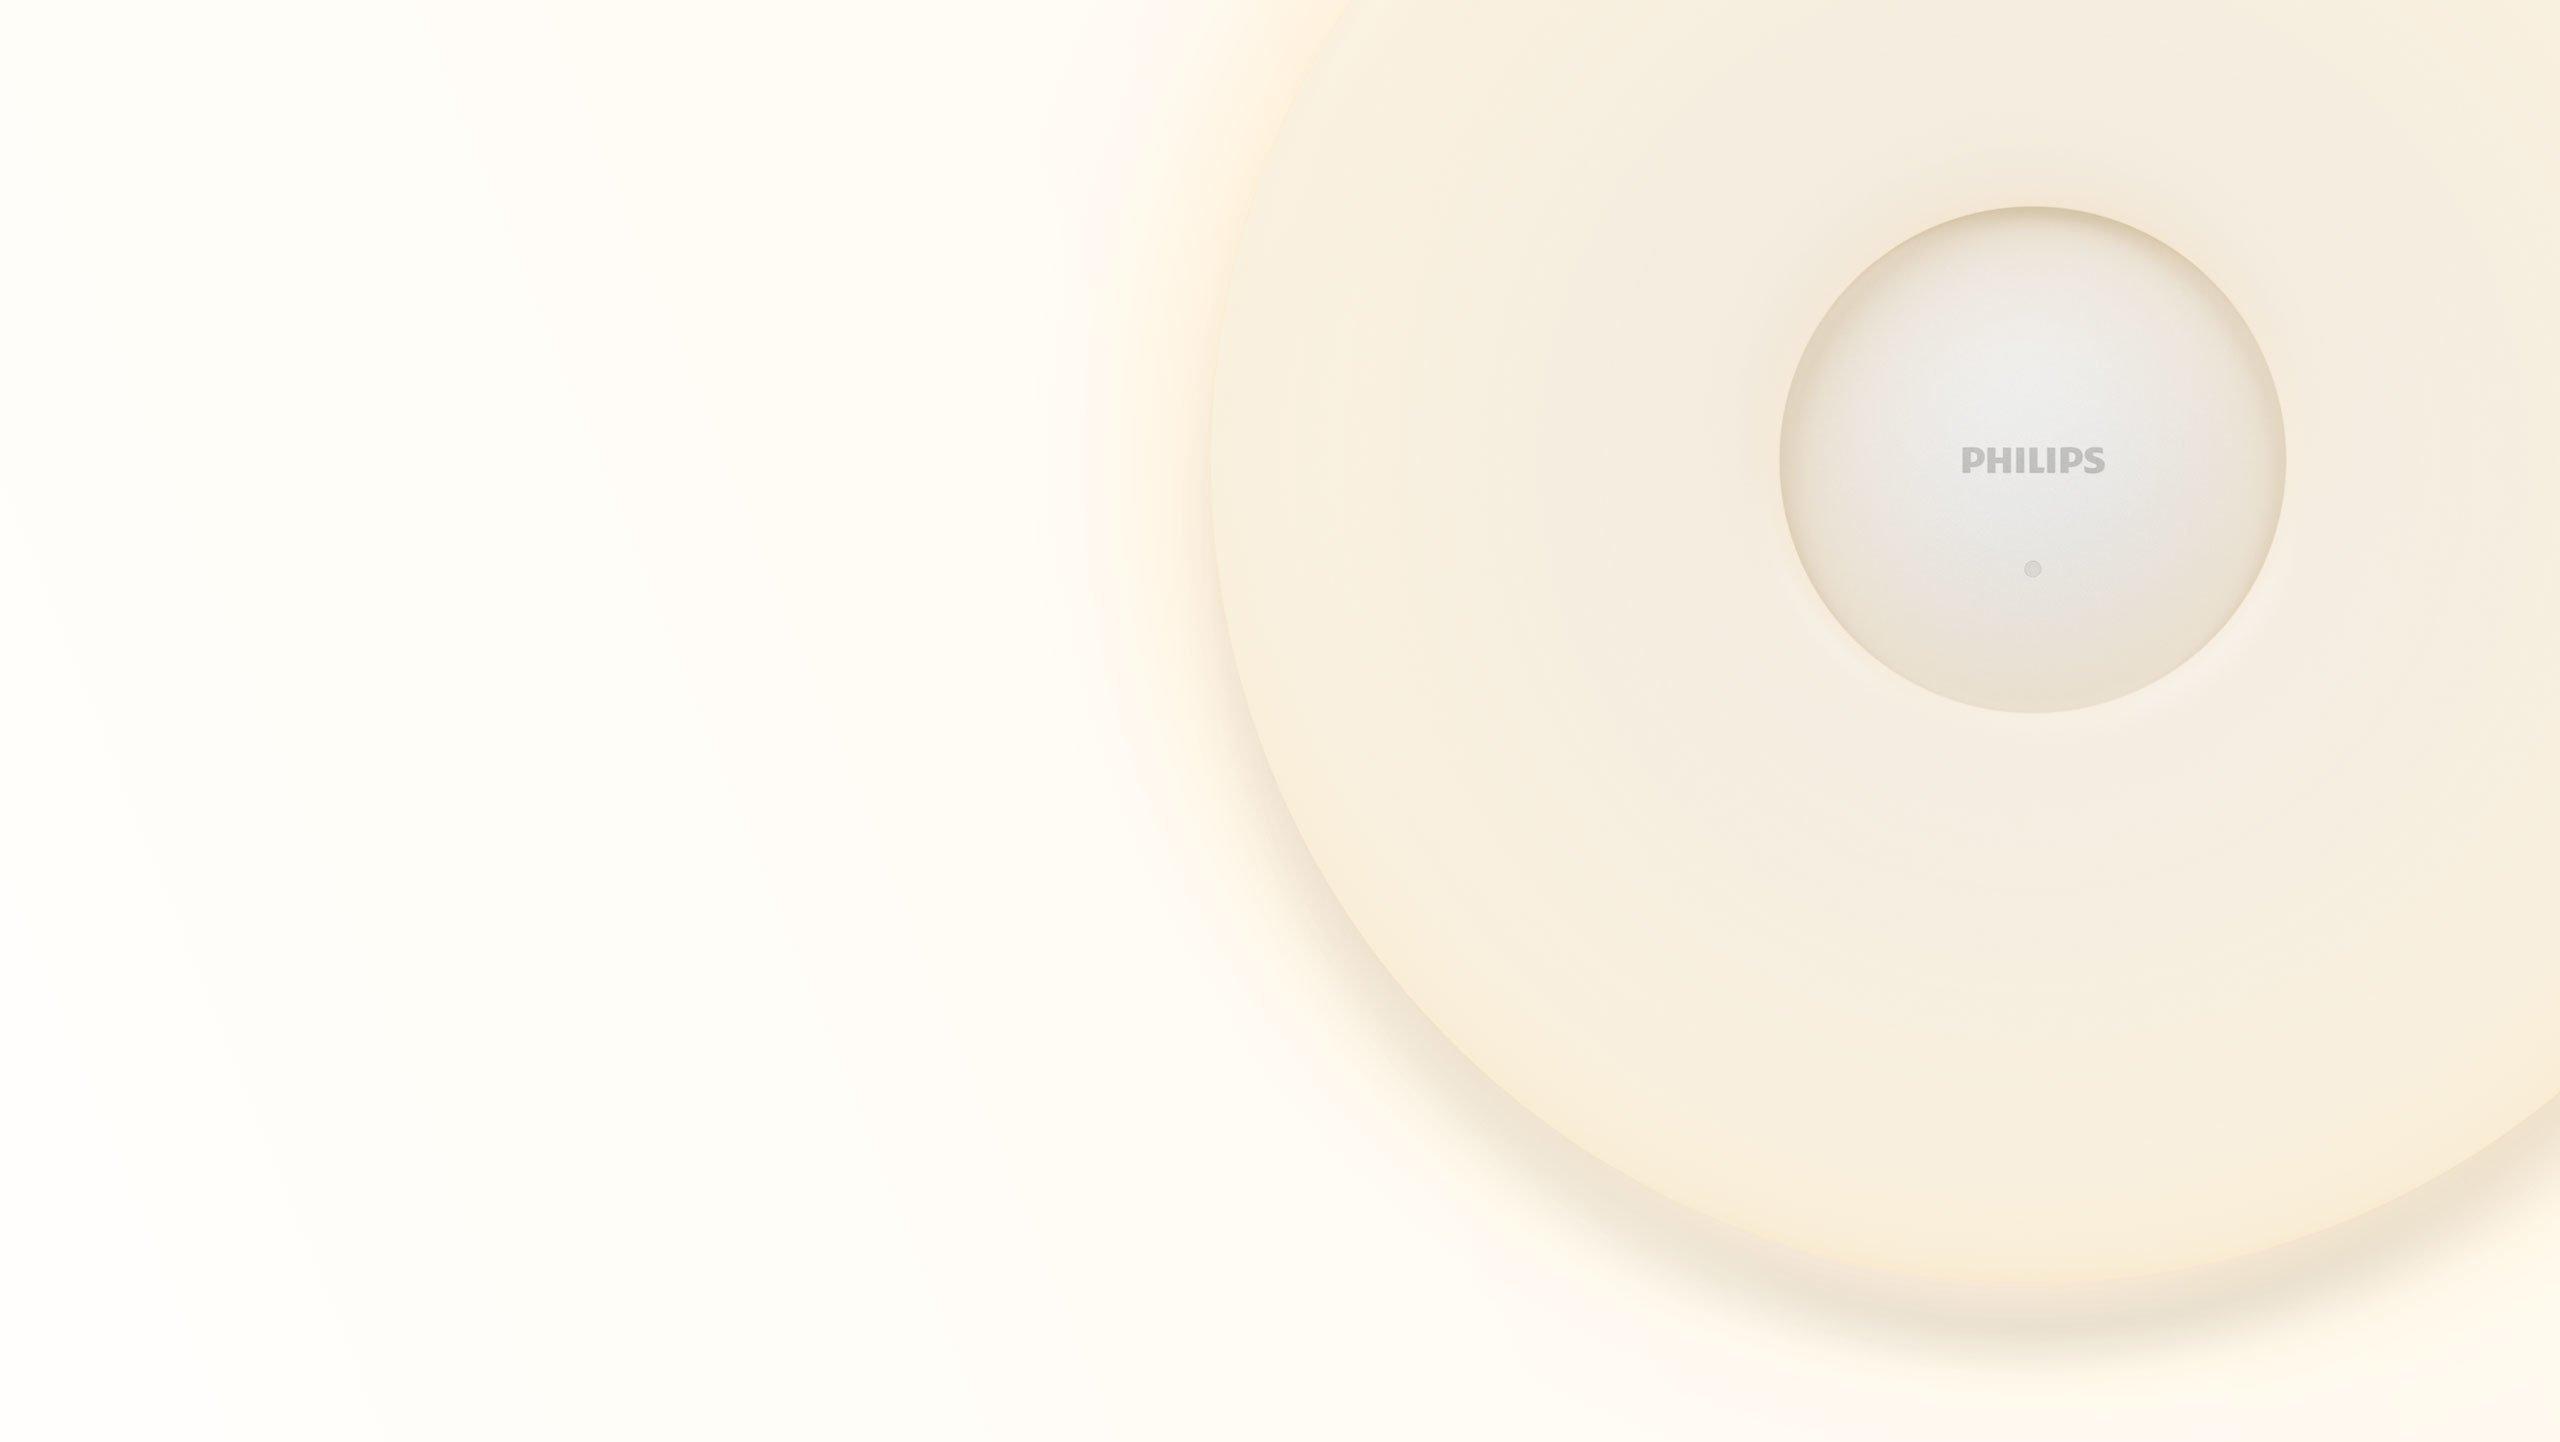 potolochnyj-svetilnik-xiaomi-philips-eyecare-smart-ceiling-led-lamp-cena